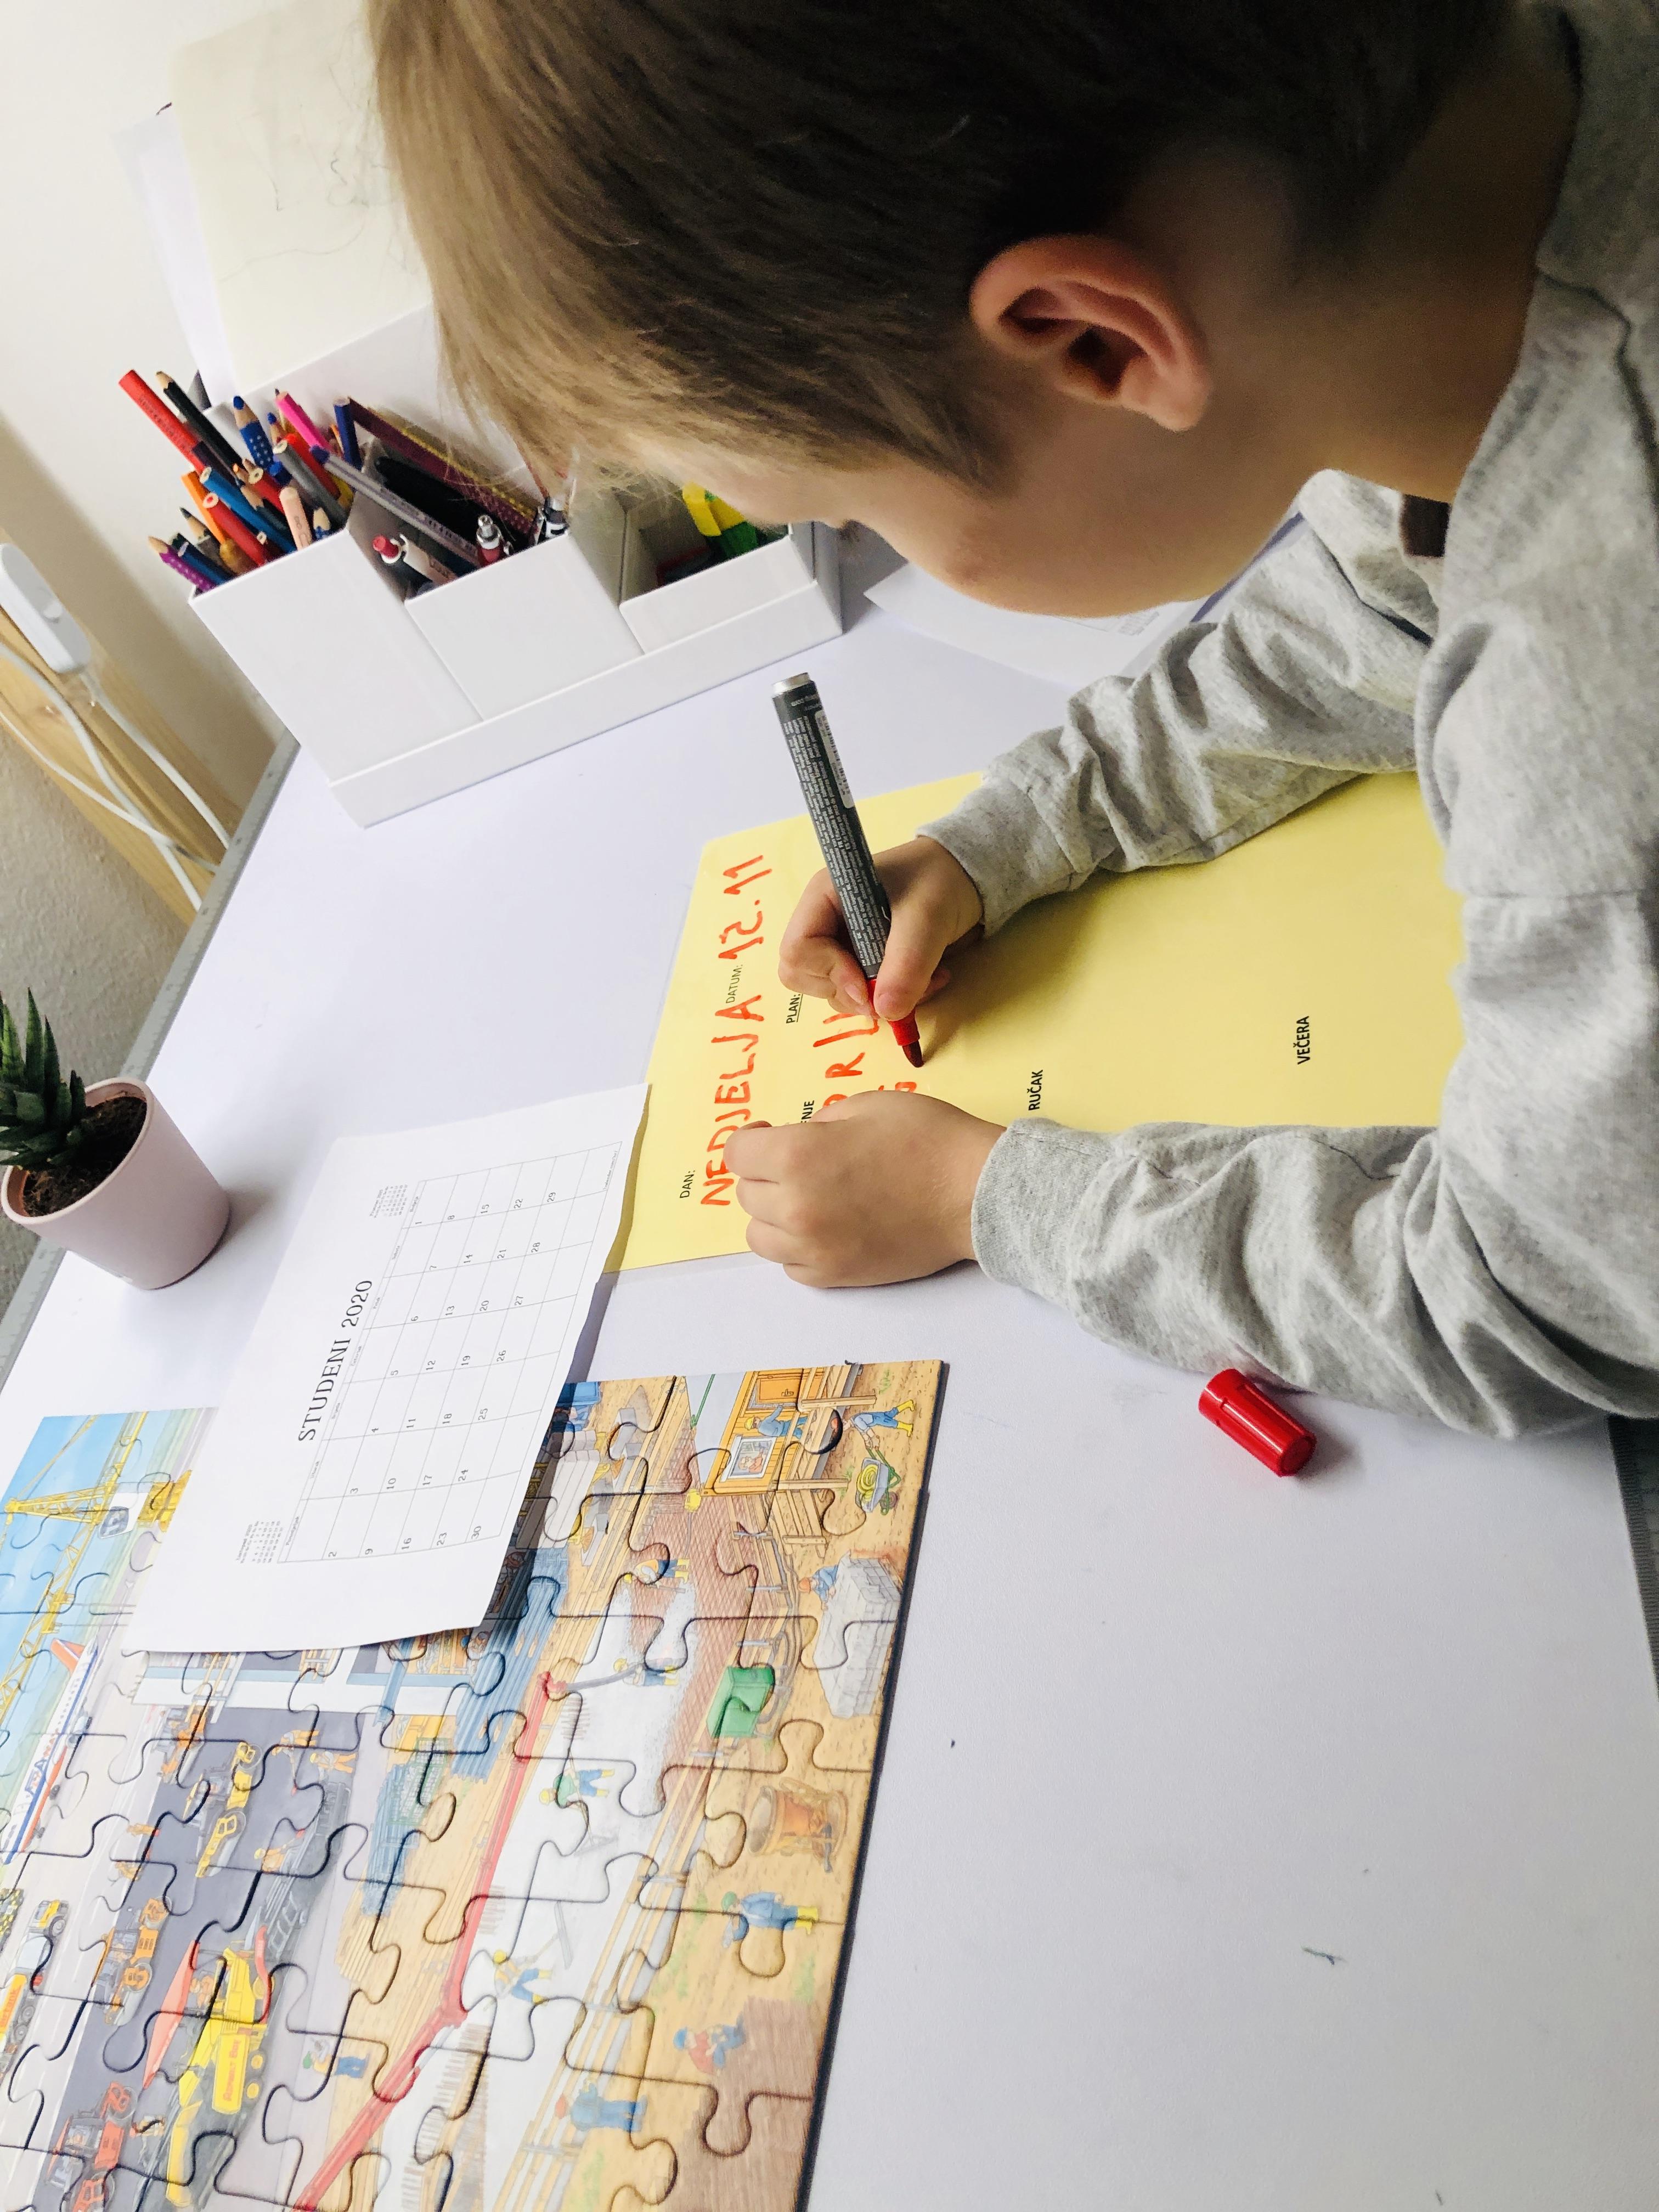 kid making his list of activities